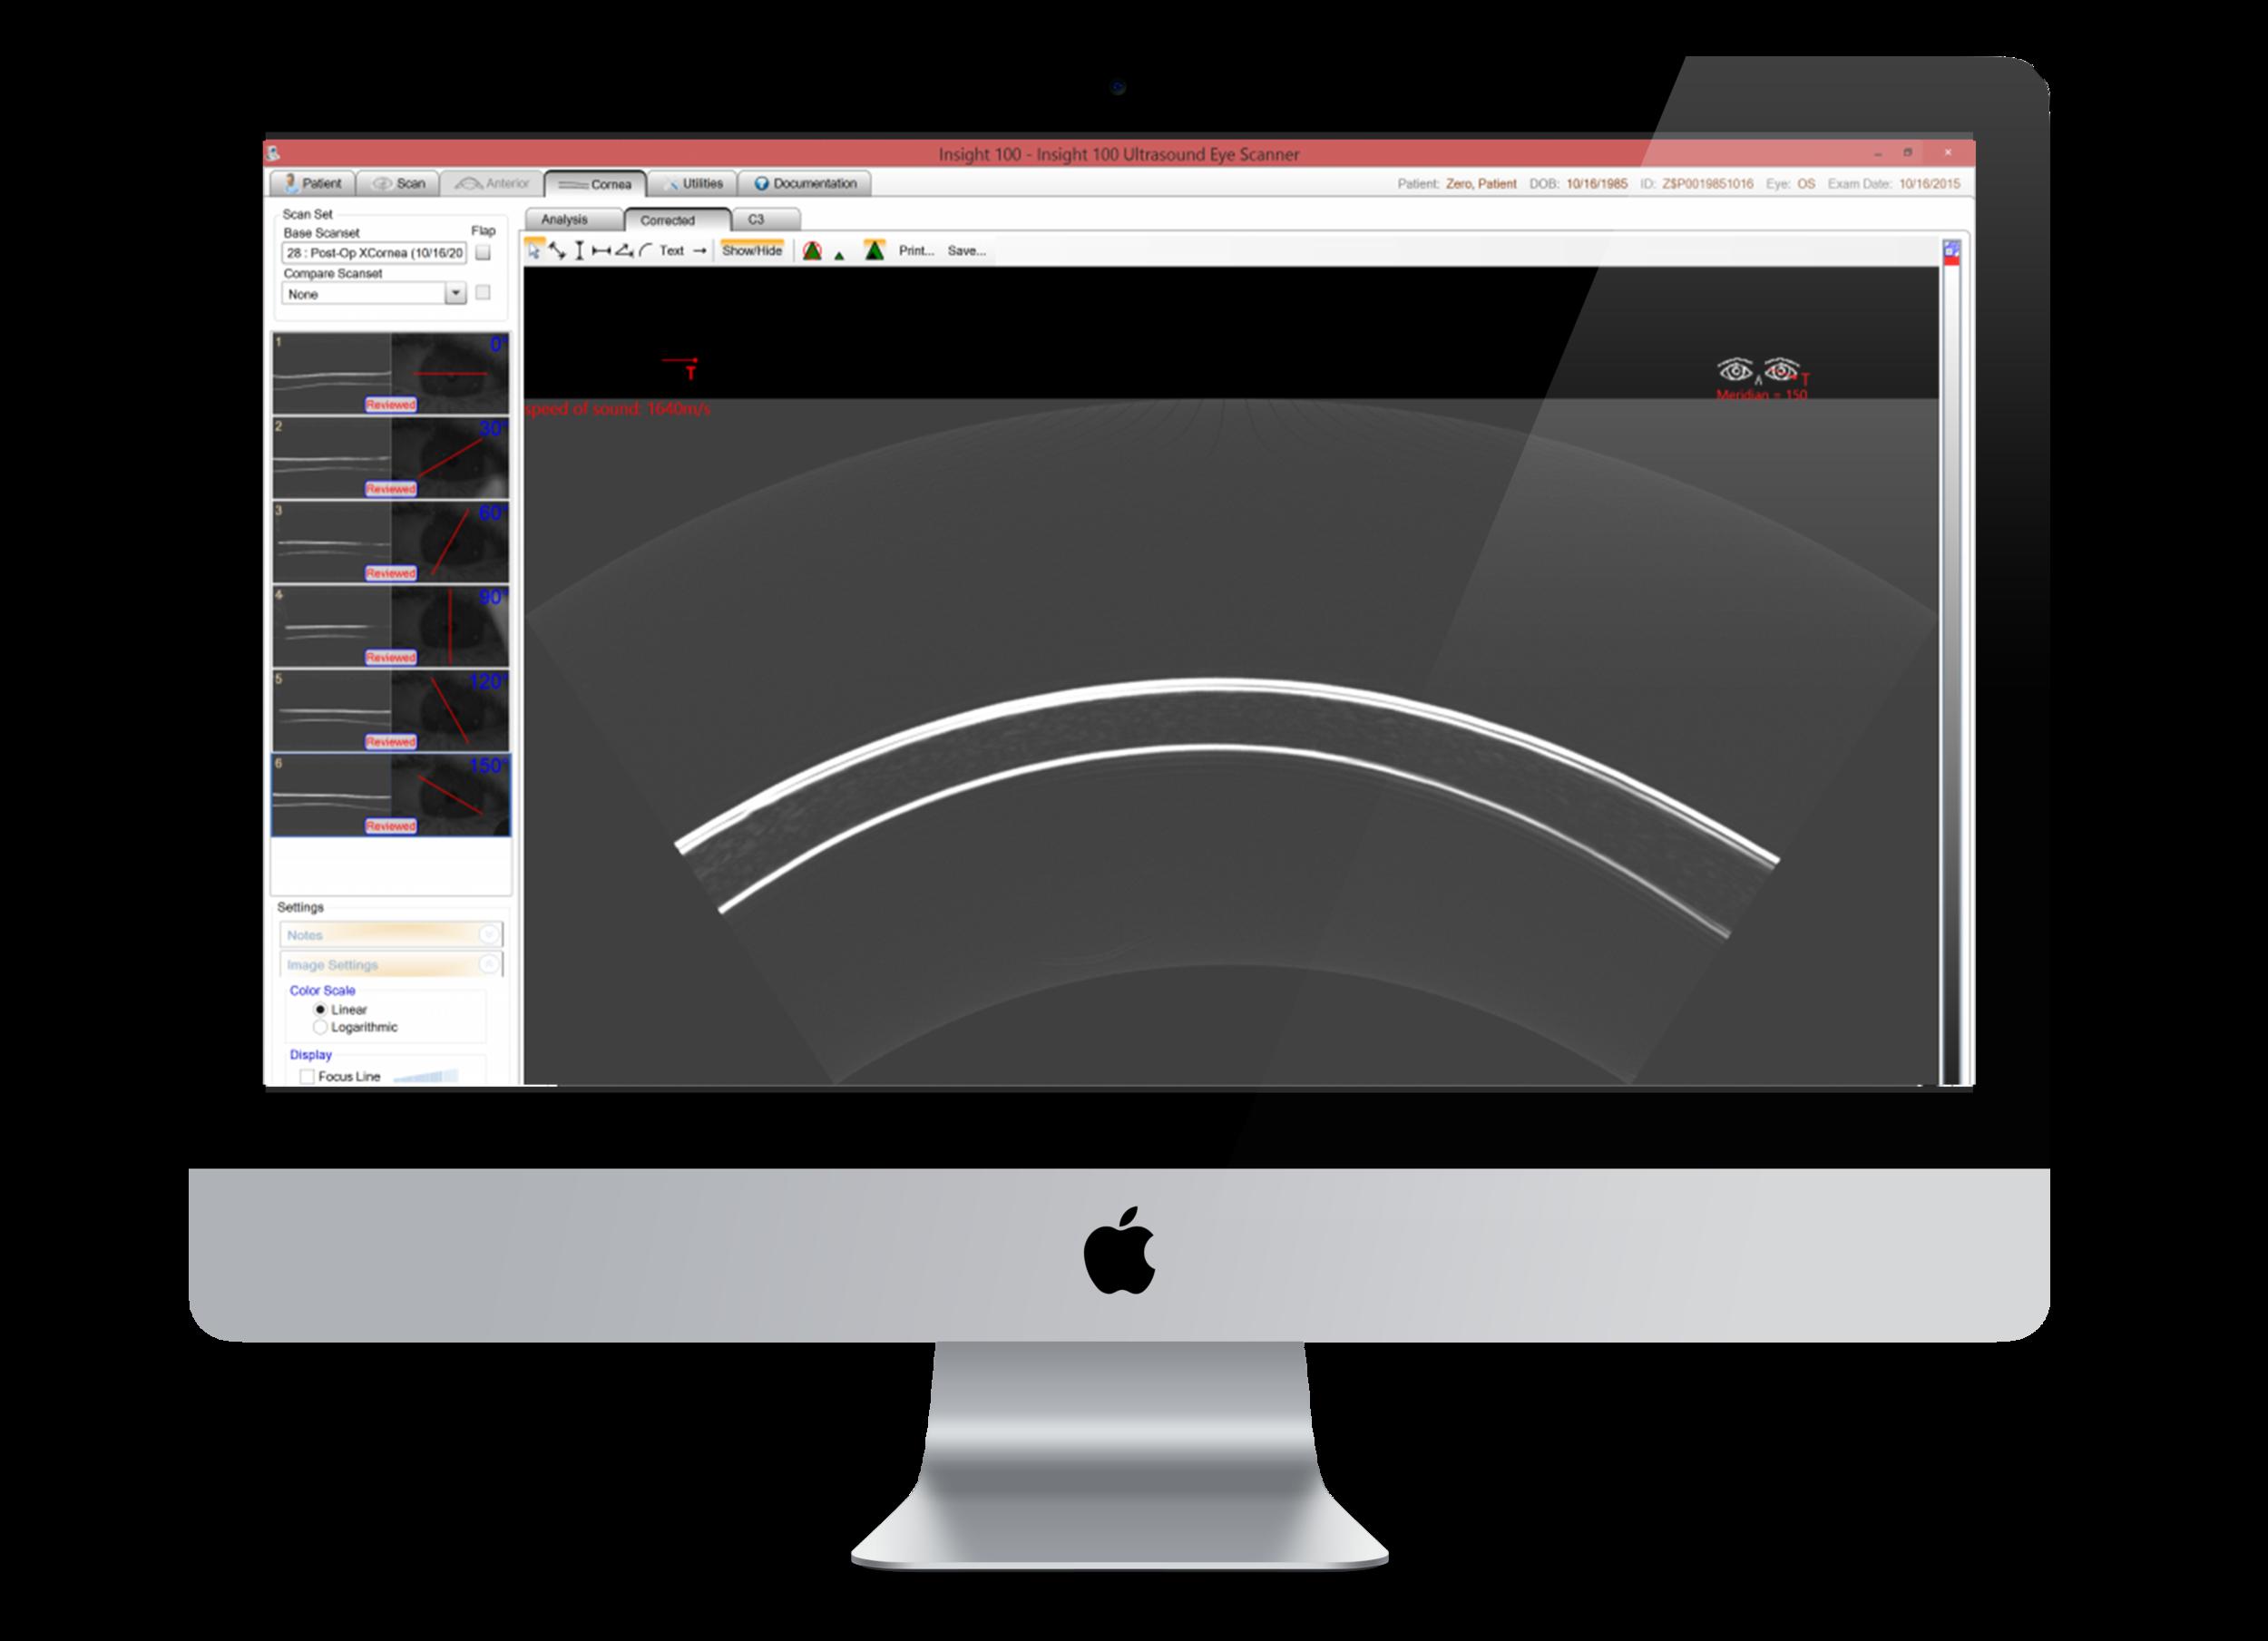 Mockup-ArcScan-Software-03.png